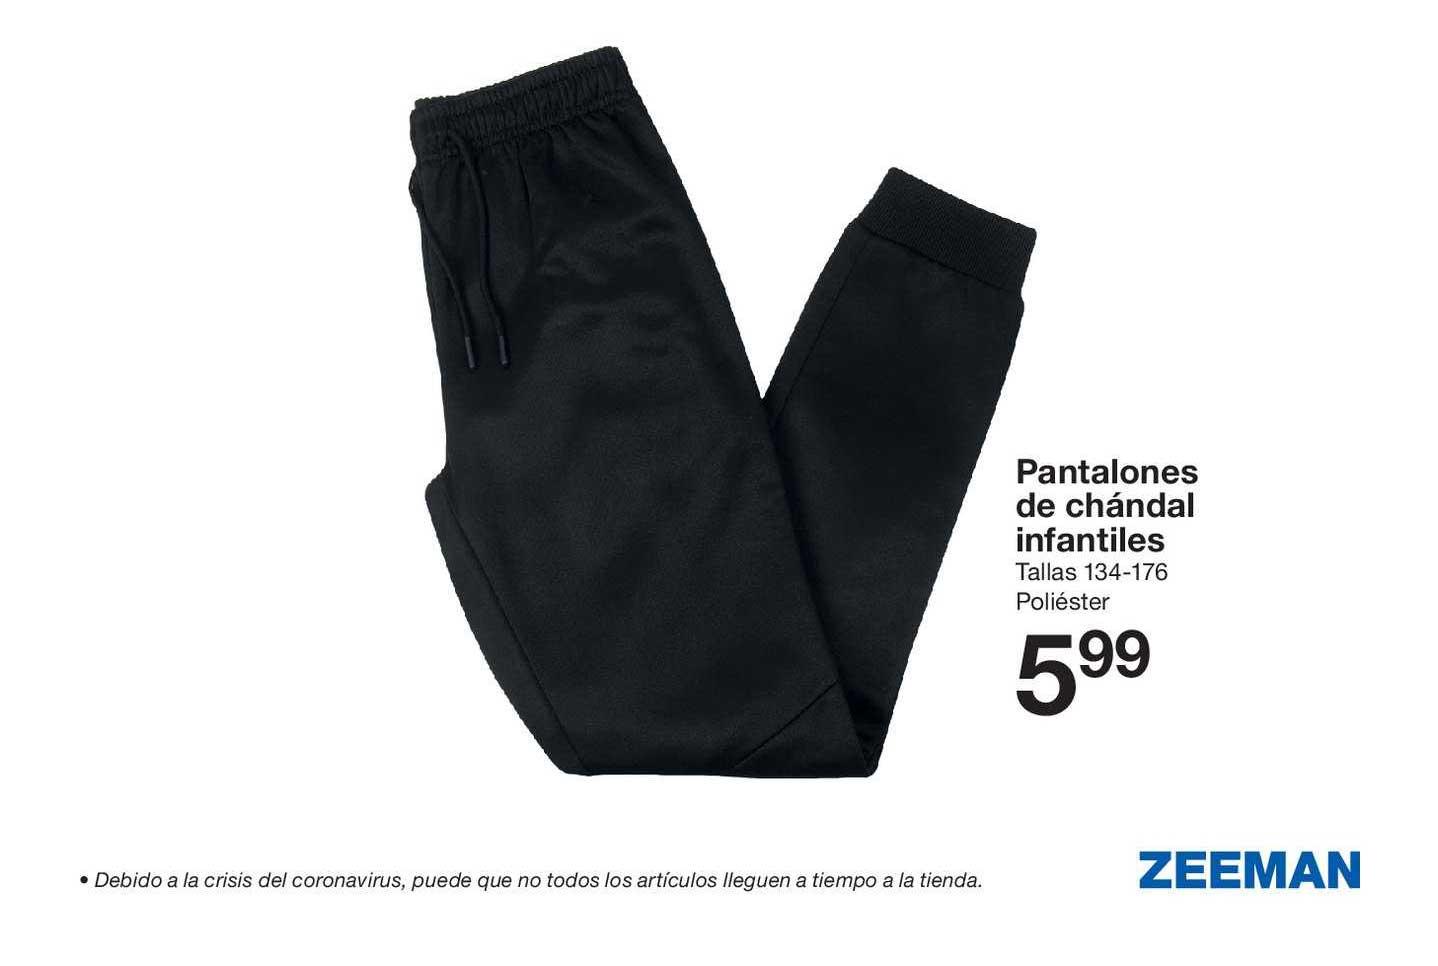 Oferta Pantalones De Chandal Infantiles En Zeeman